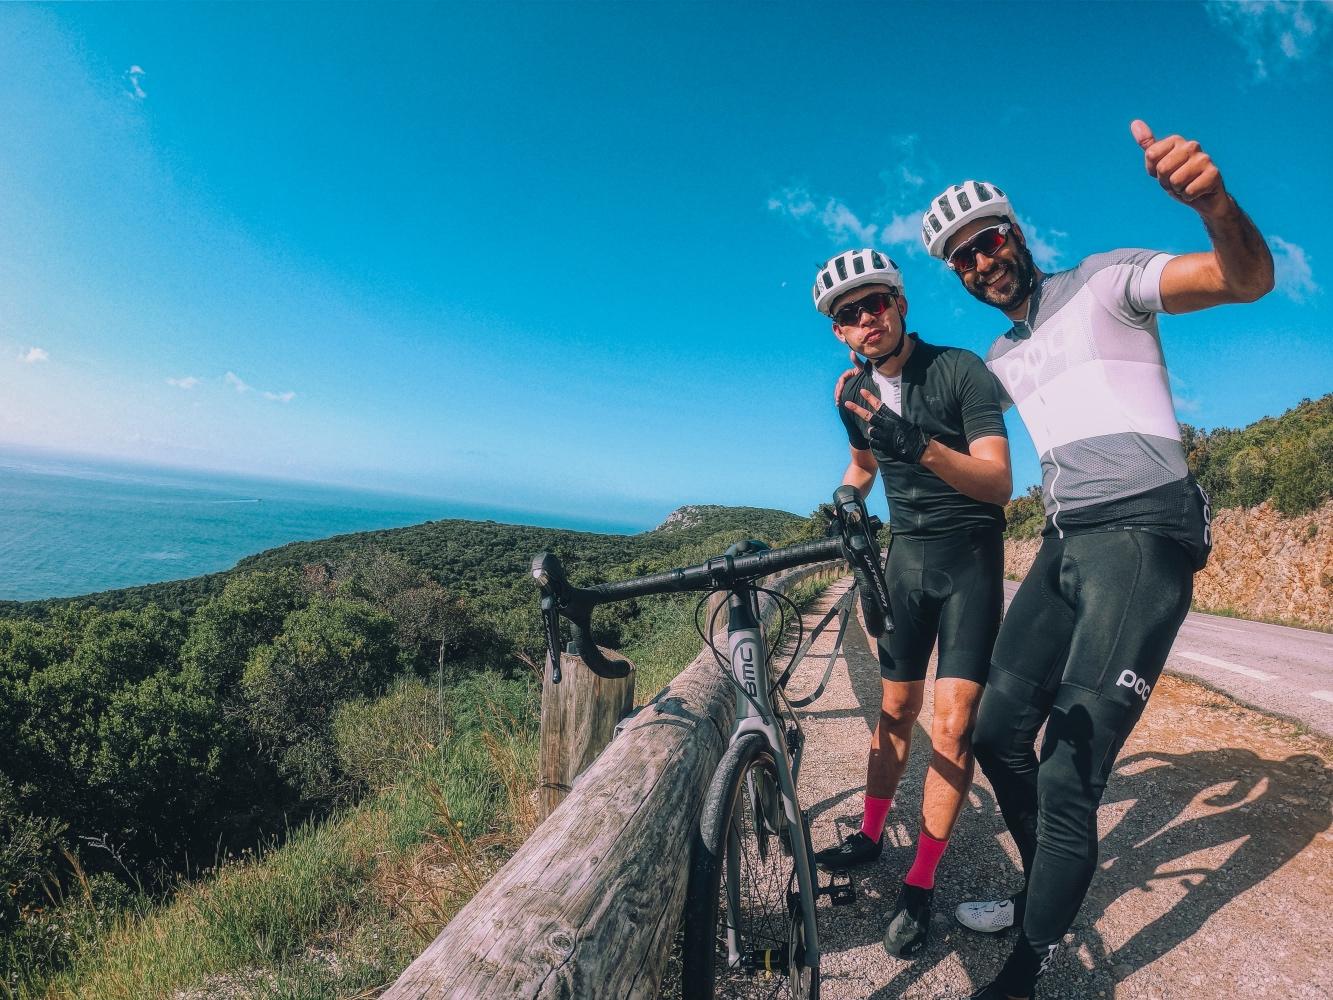 Raod_Cycling_Sintra_Cascais_Rentals_Lisbon